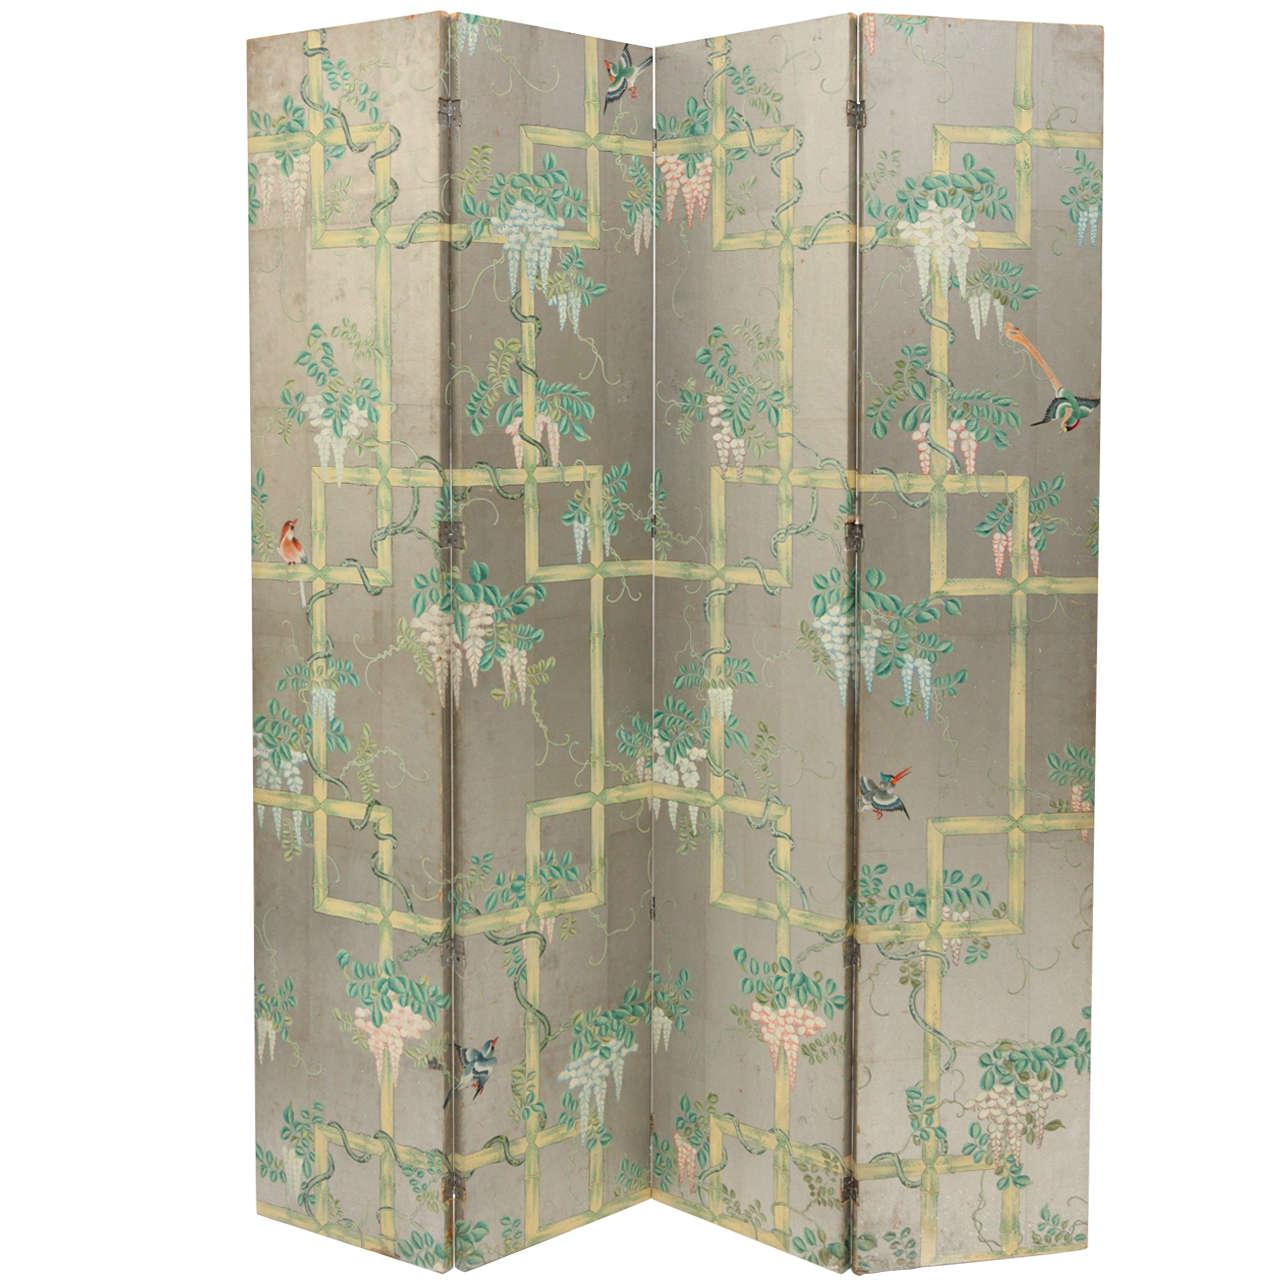 Folding Screen Chinoiserie Four Panel Wallpaper Folding Screen At 1stdibs